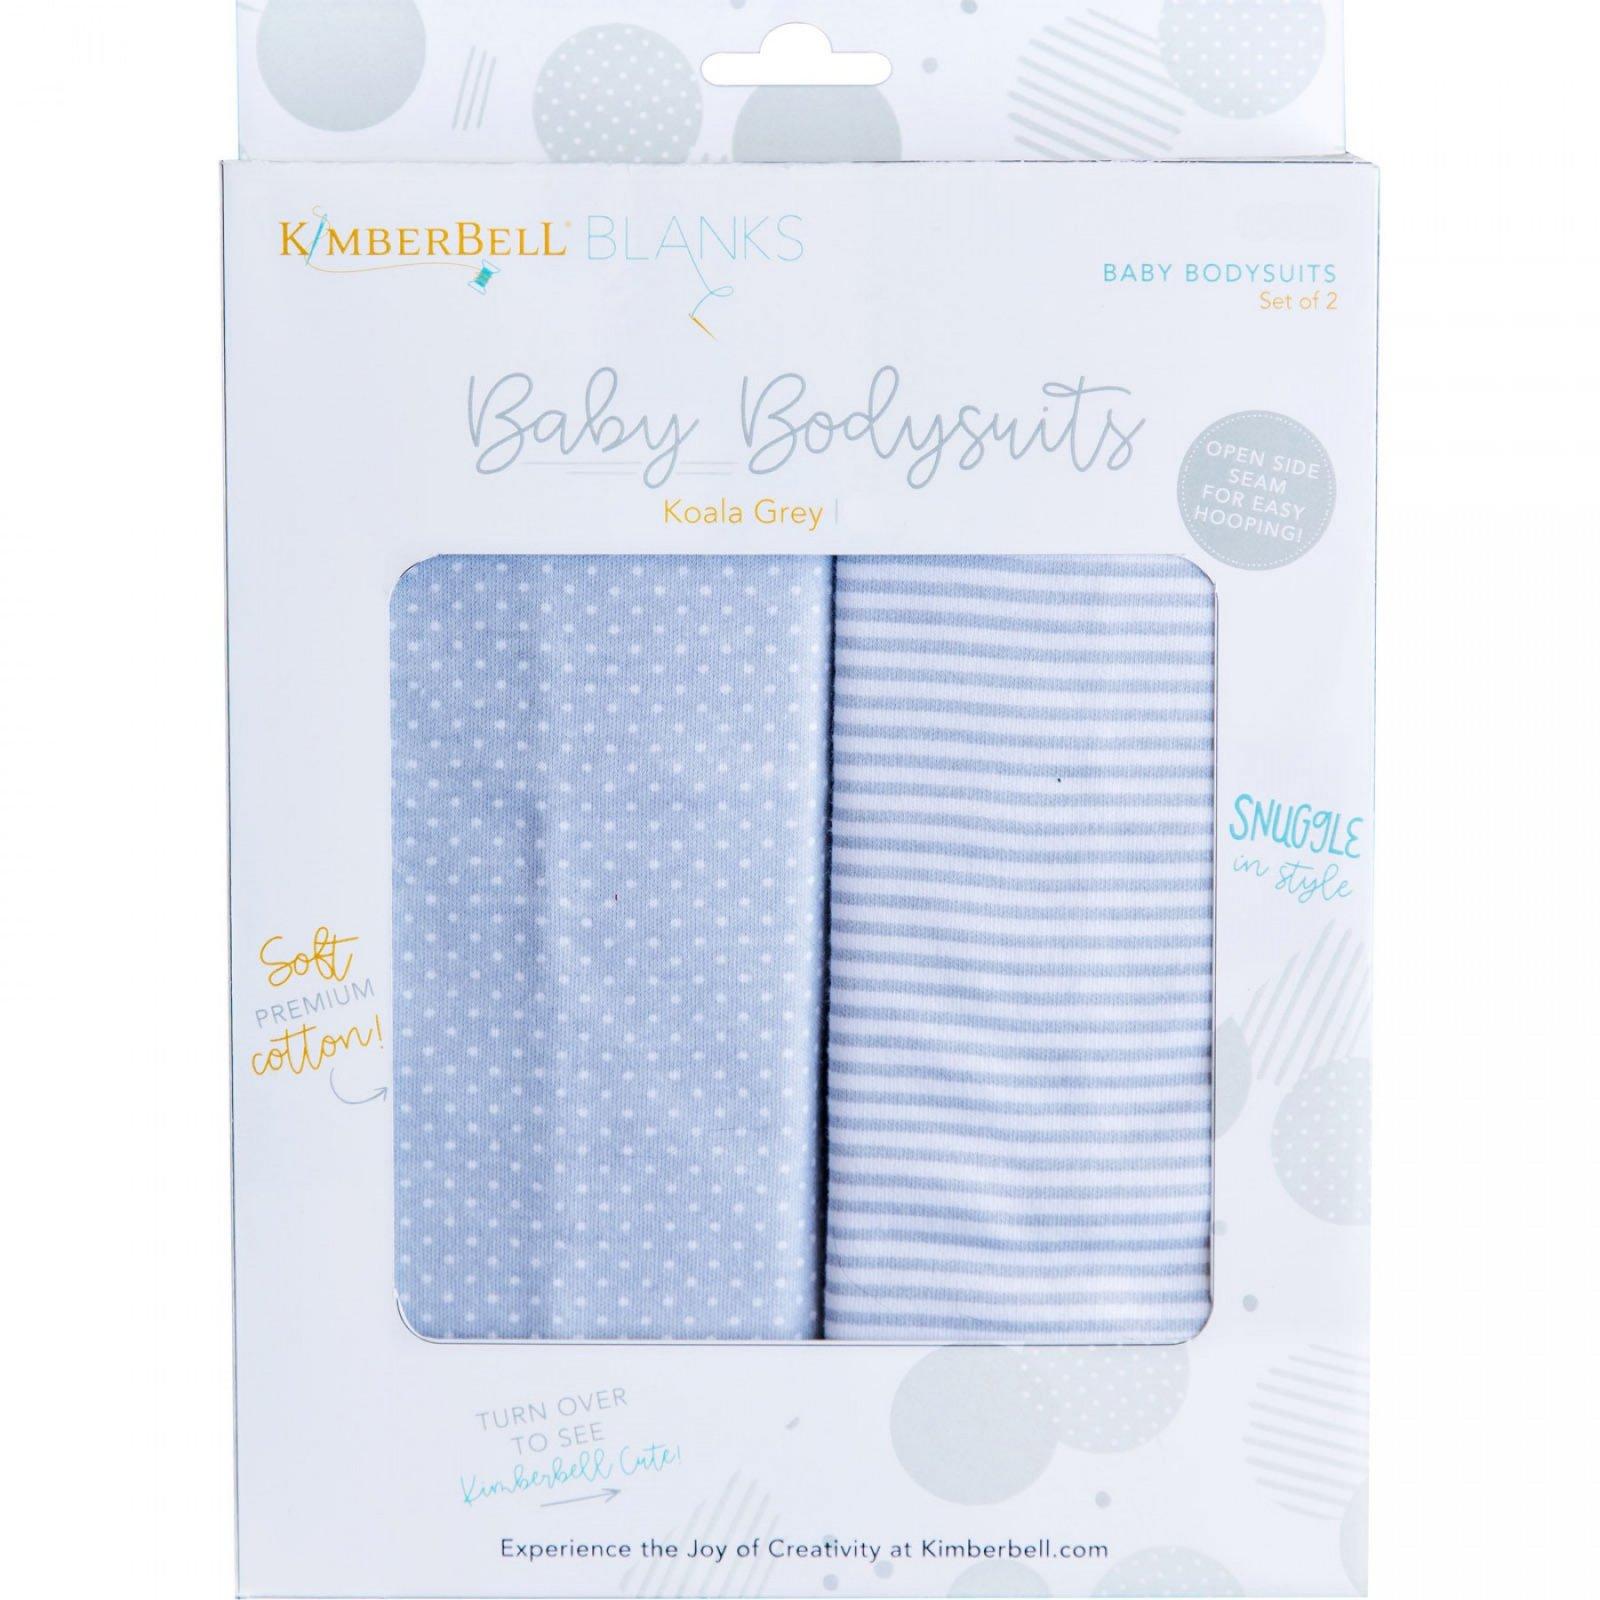 KIDKB218 - 6-9 Mo Koala Grey Baby Bodysuit